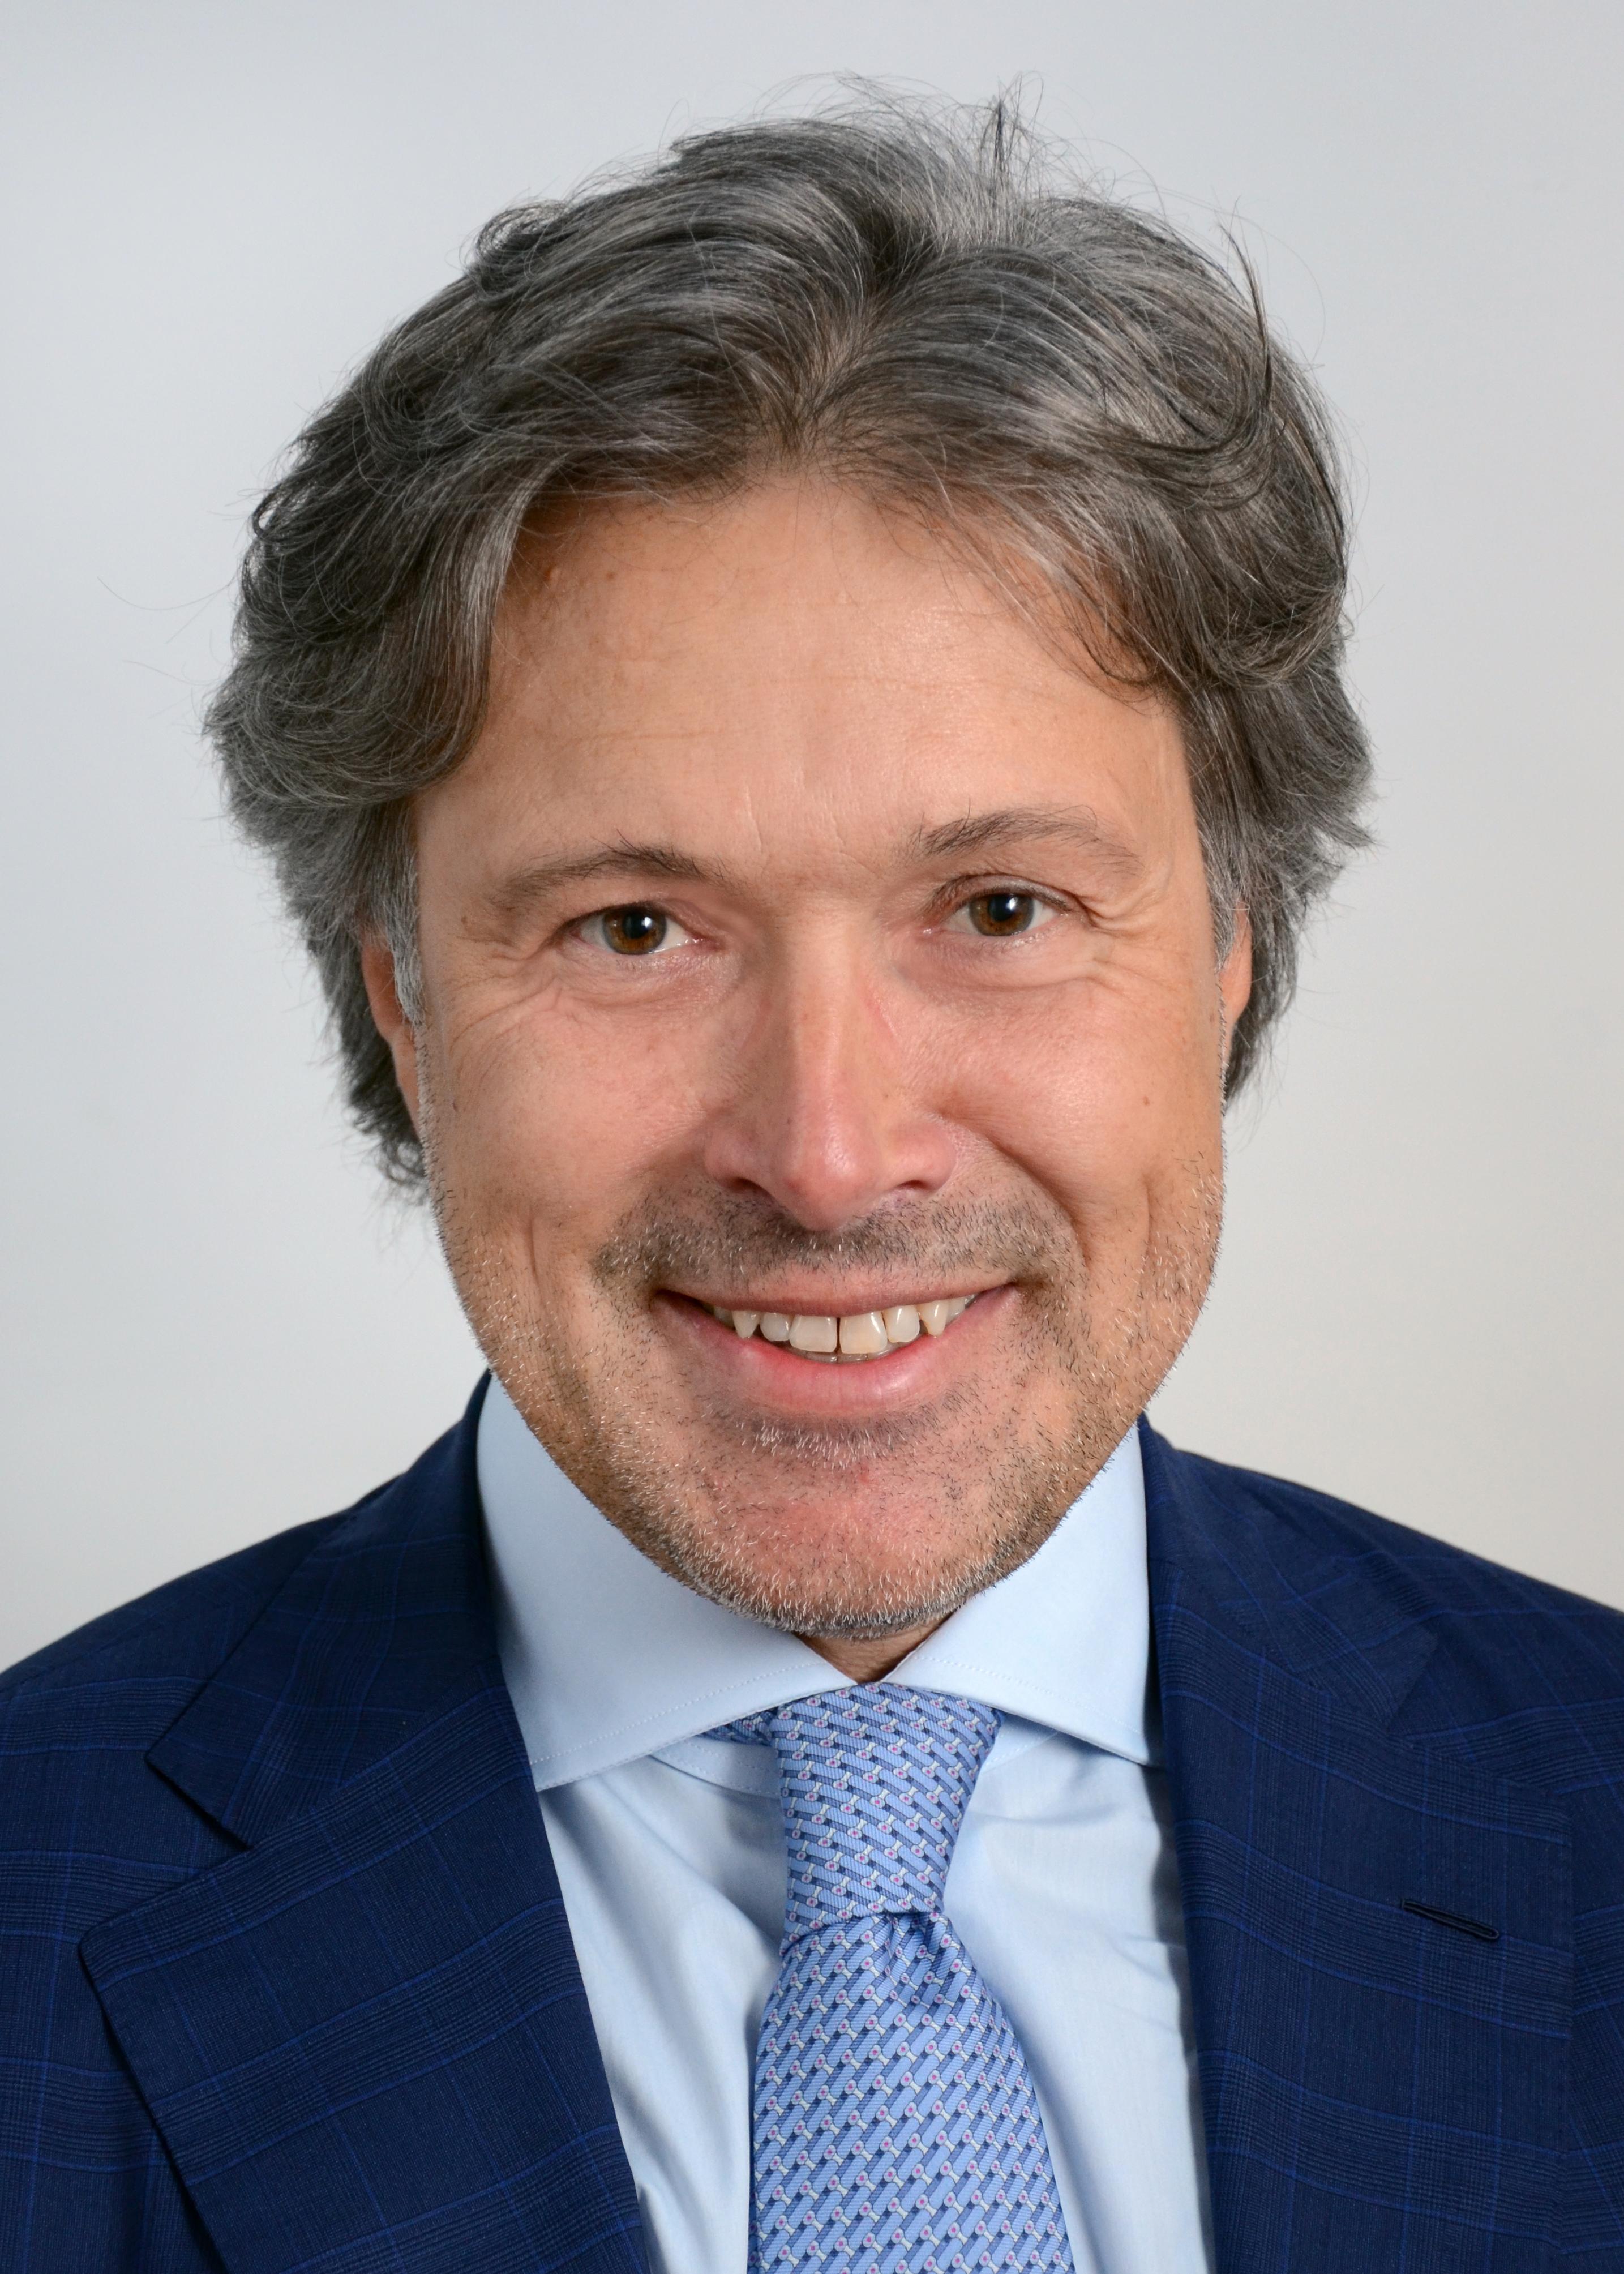 Bini Sergio Emidio